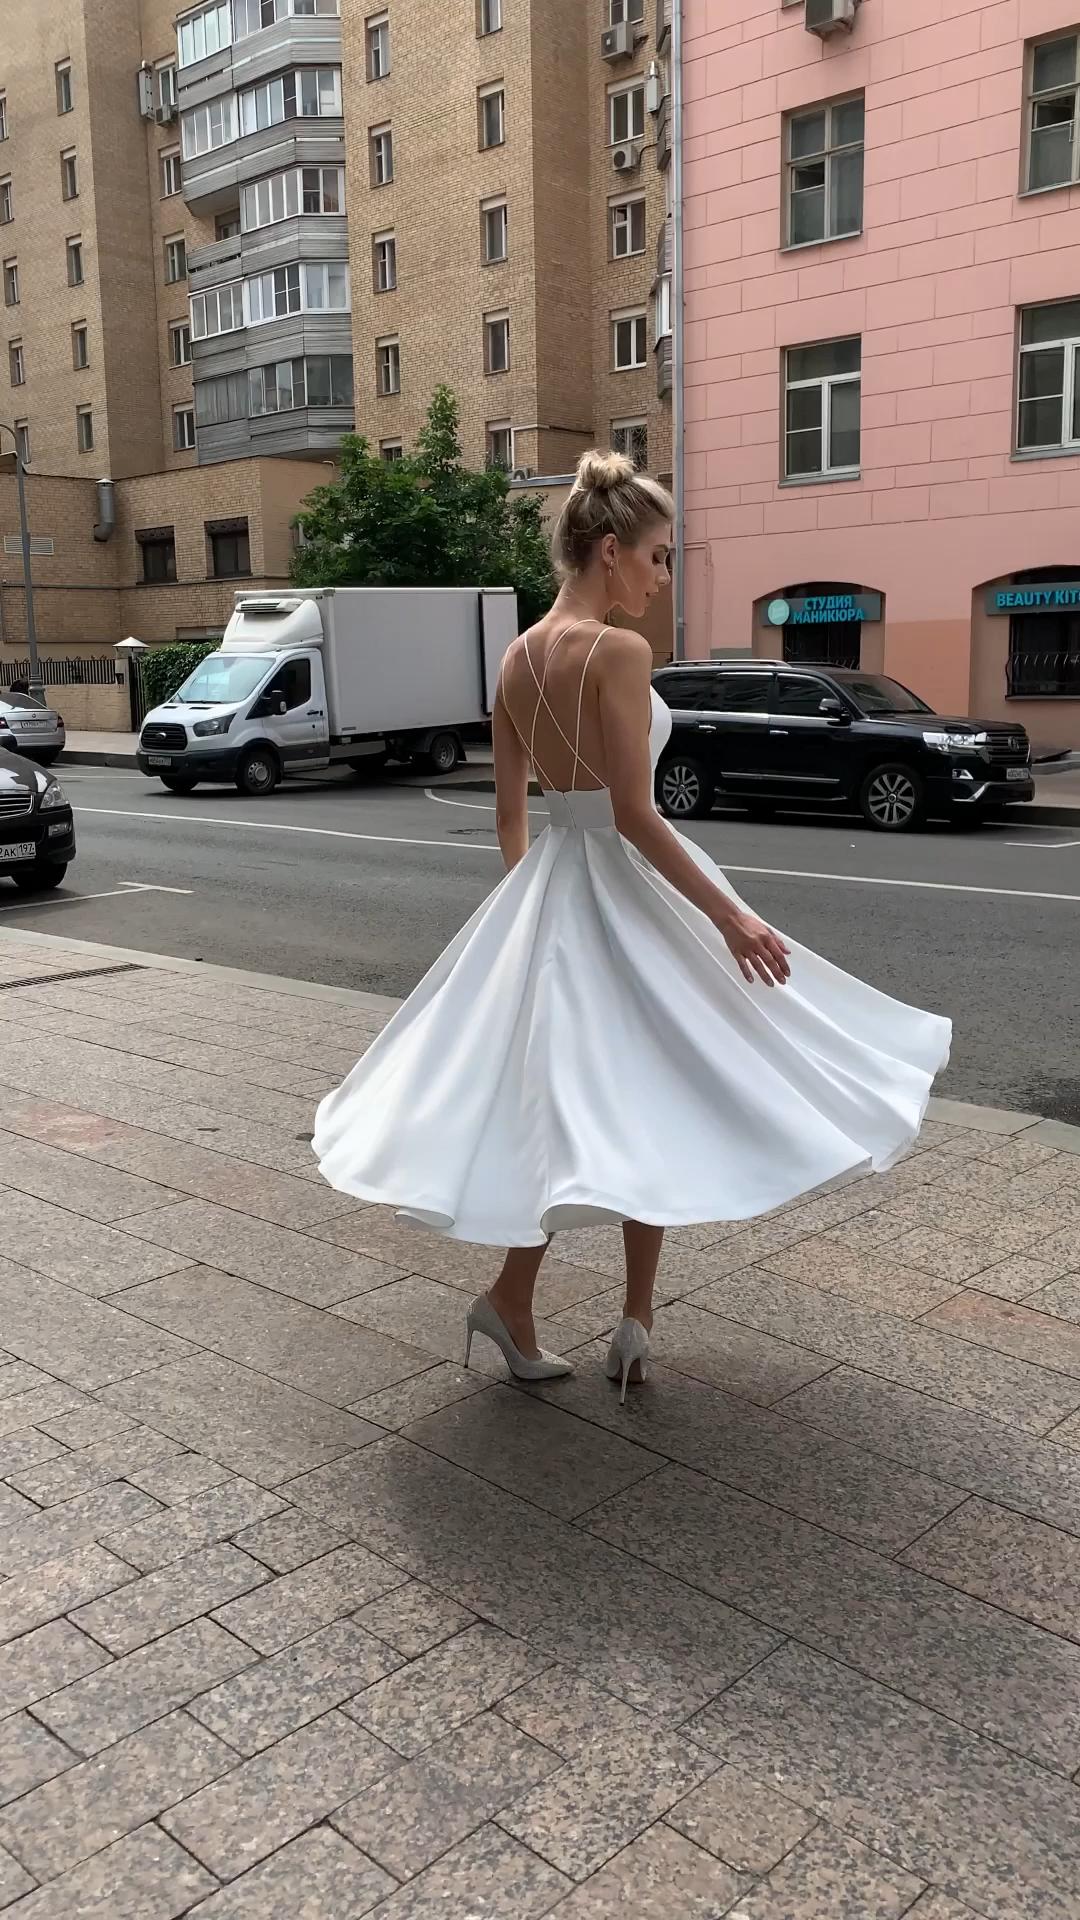 Свадебное платье Ким/Wedding dress Kim -   19 style Icons dress ideas